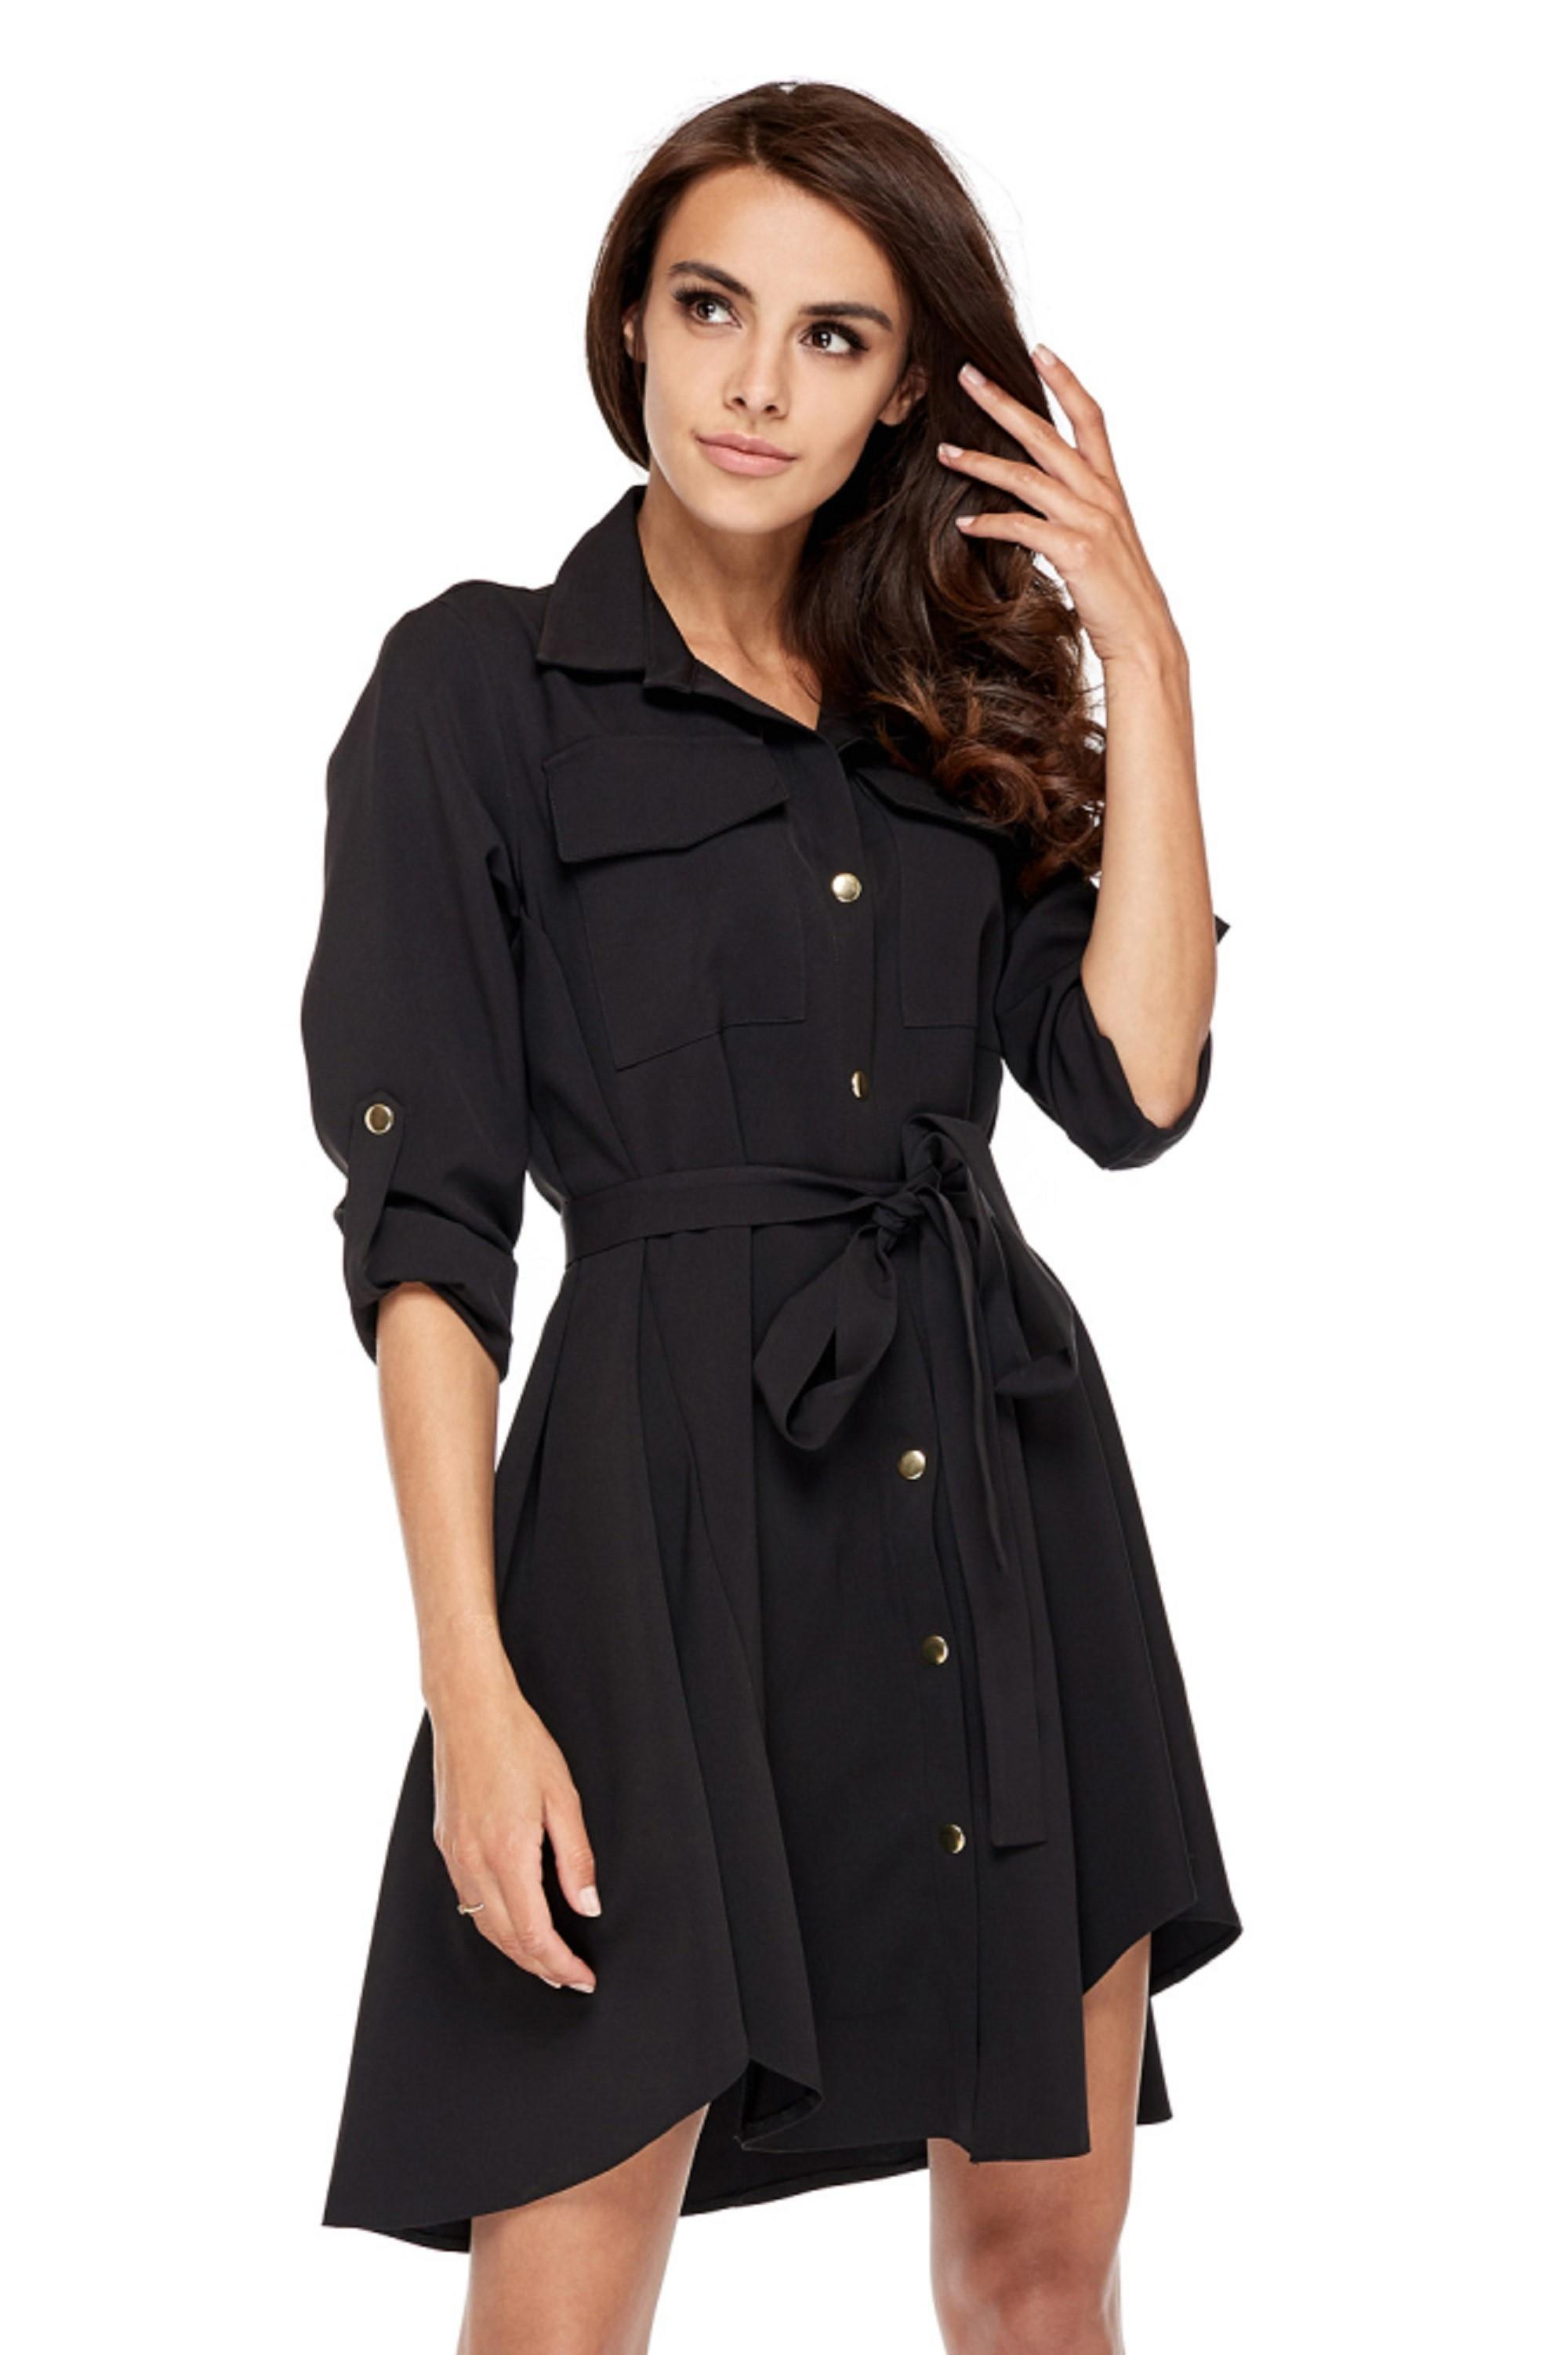 Čierne krátke košeľové šaty - S